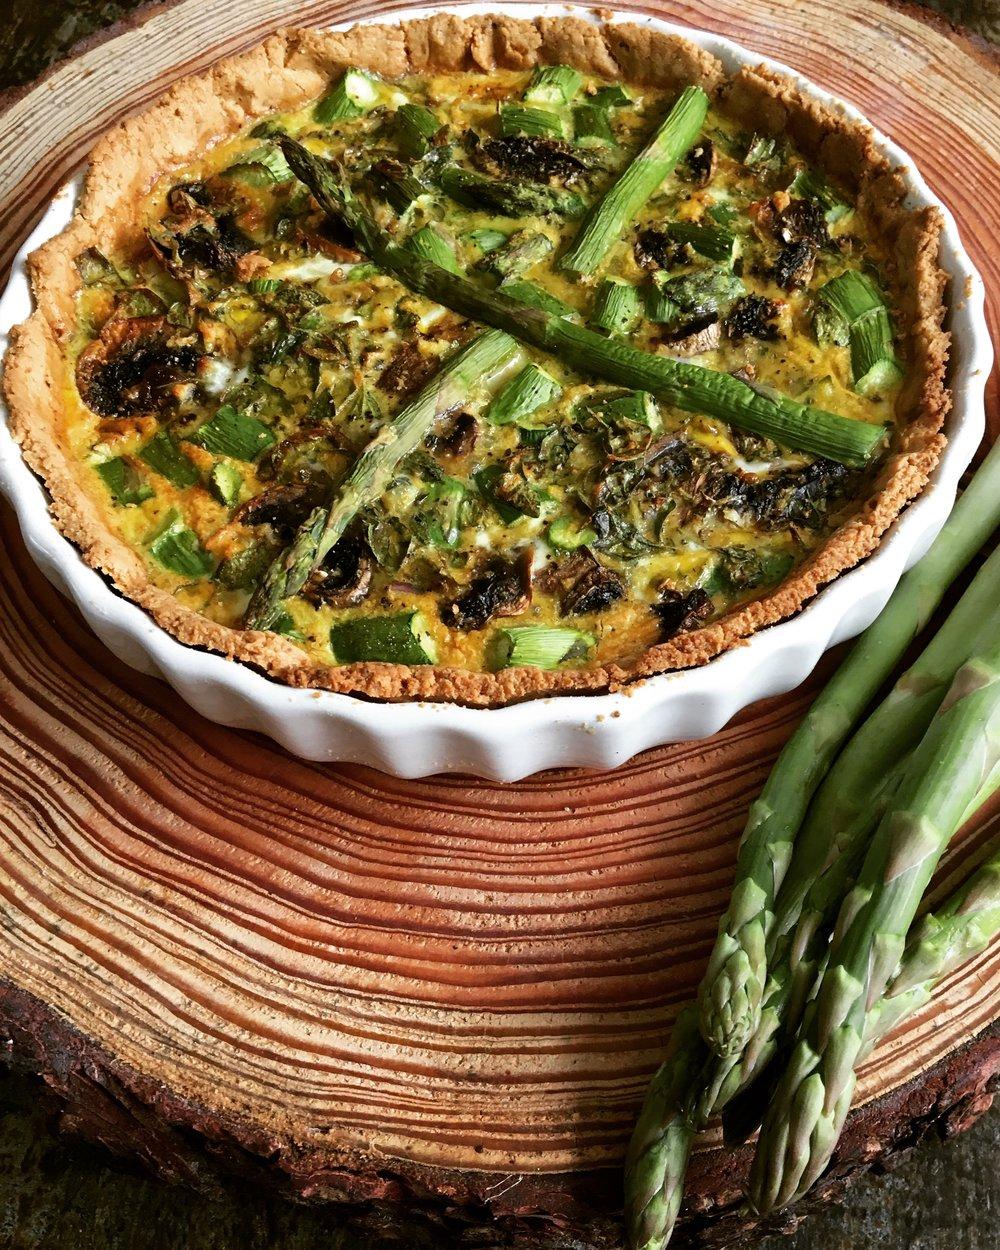 Asparagus and Mushroom Paleo Quiche